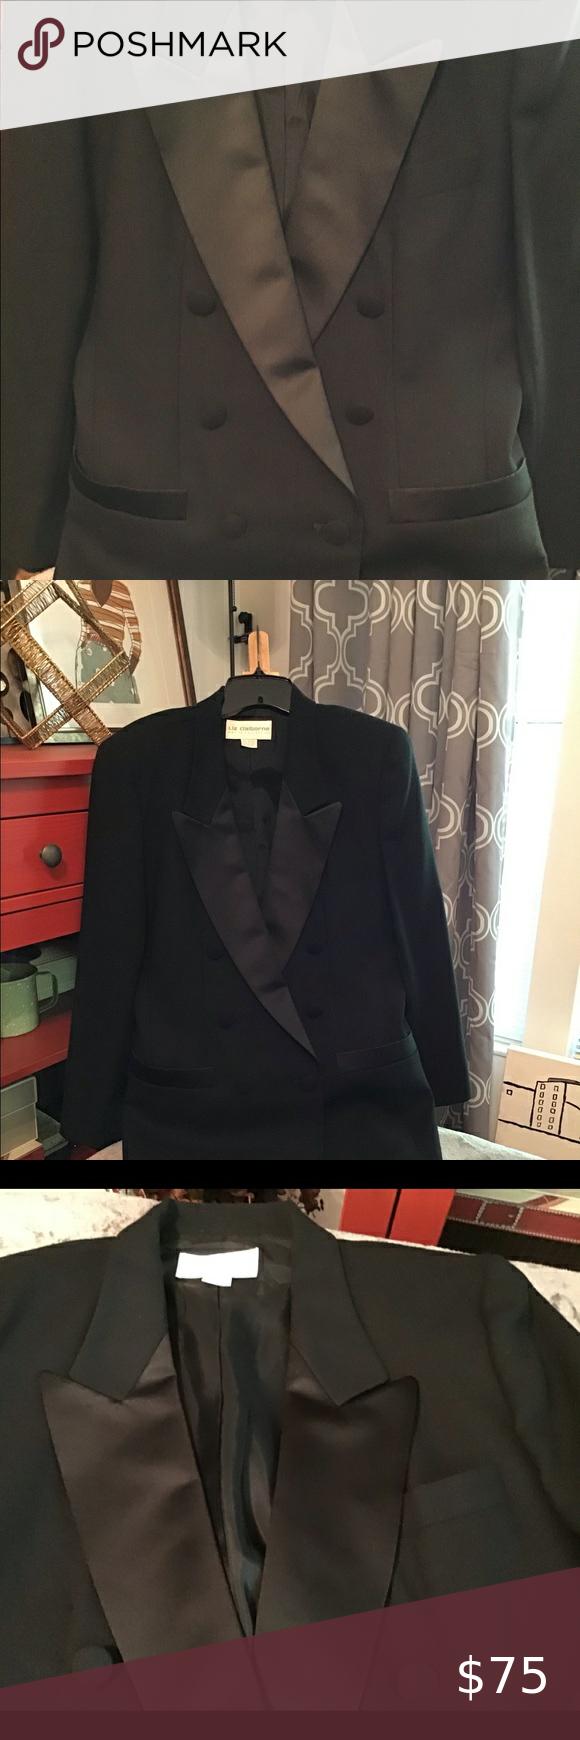 Liz Claiborne Tuxedo Jacket Double Breasted With Shawl Lapels Excellent Condition Liz Claiborne Jacke Black Dress Jacket Green Suede Jacket Embroidered Denim [ 1740 x 580 Pixel ]